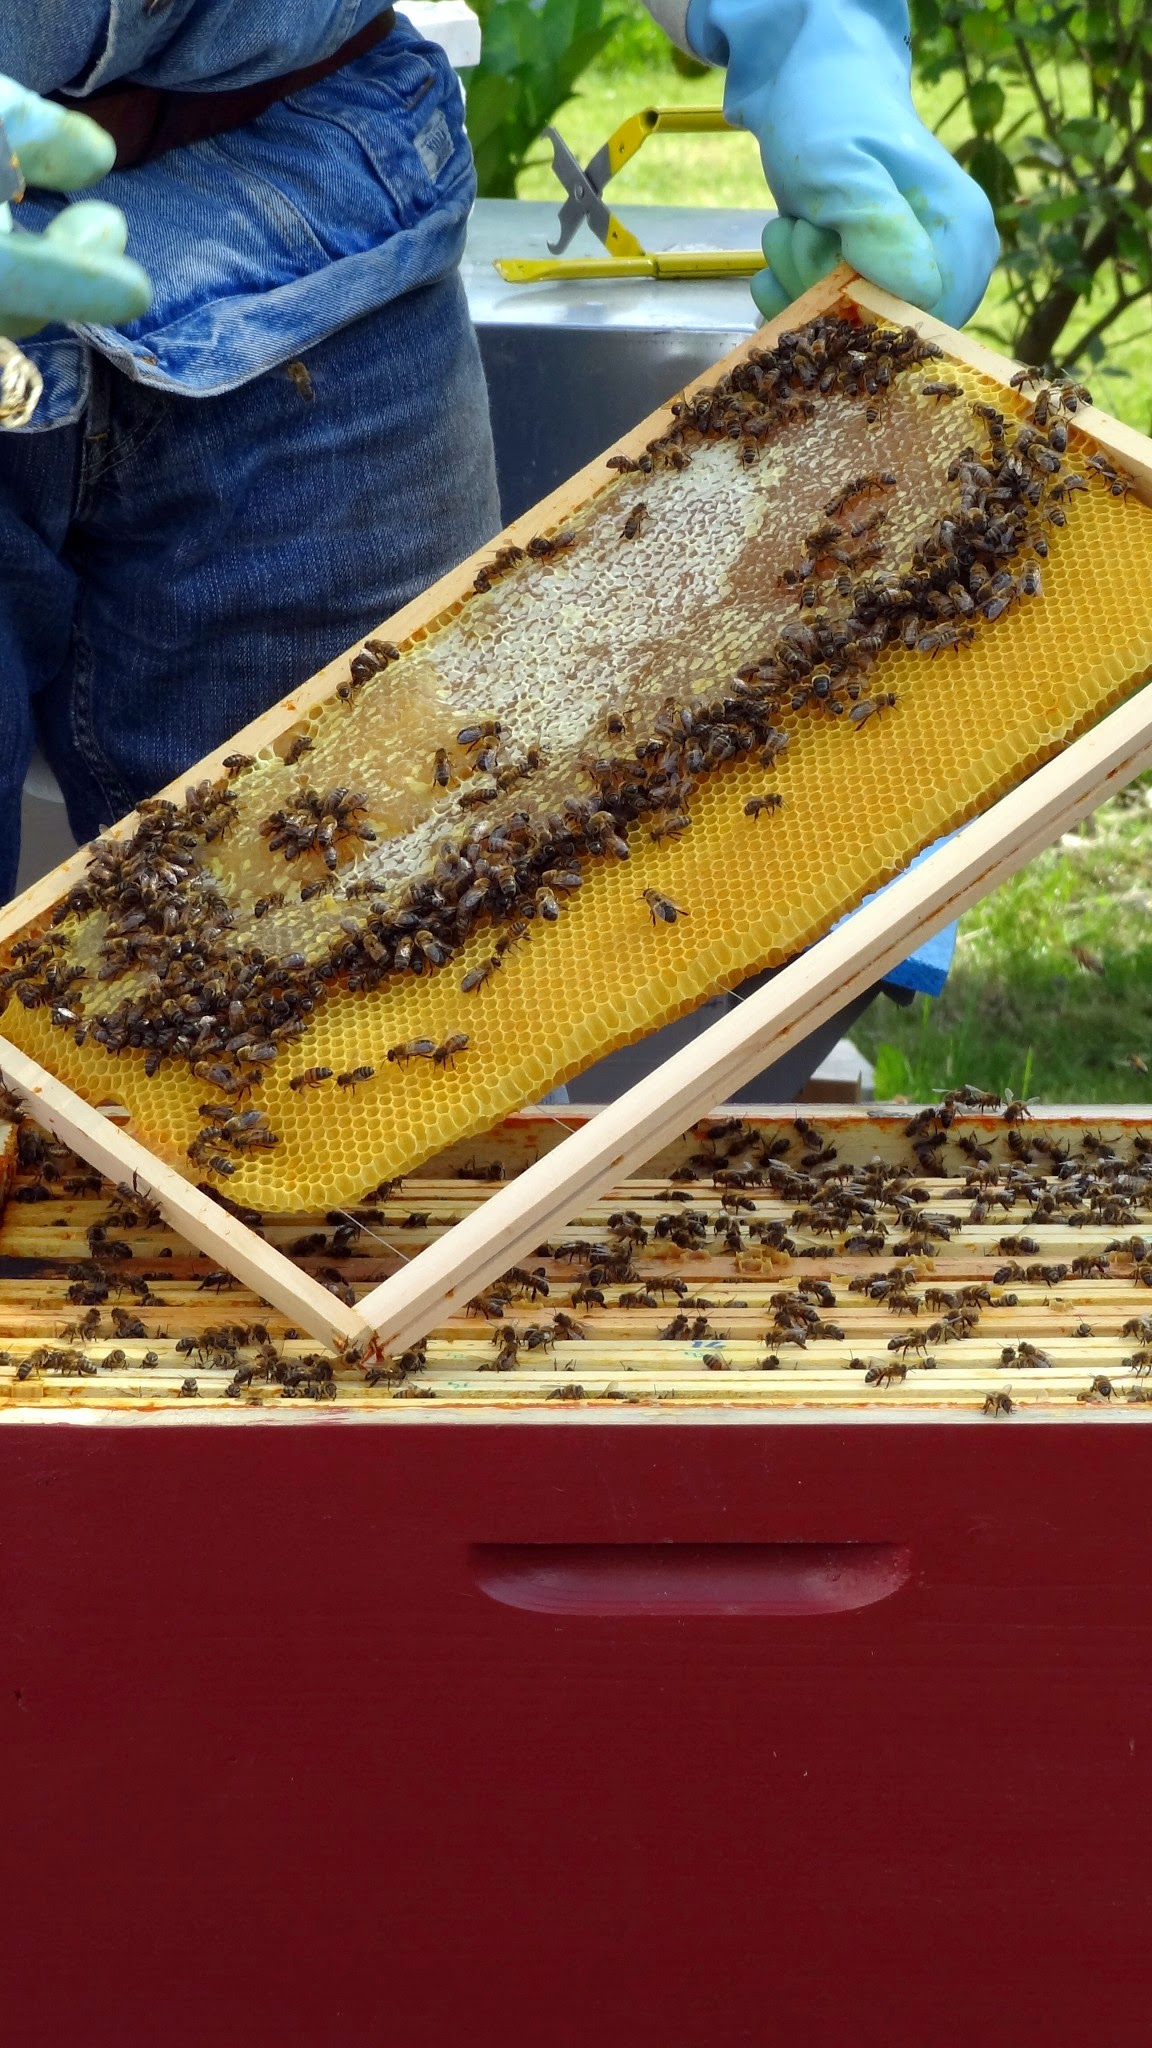 cadre de corps de ruche